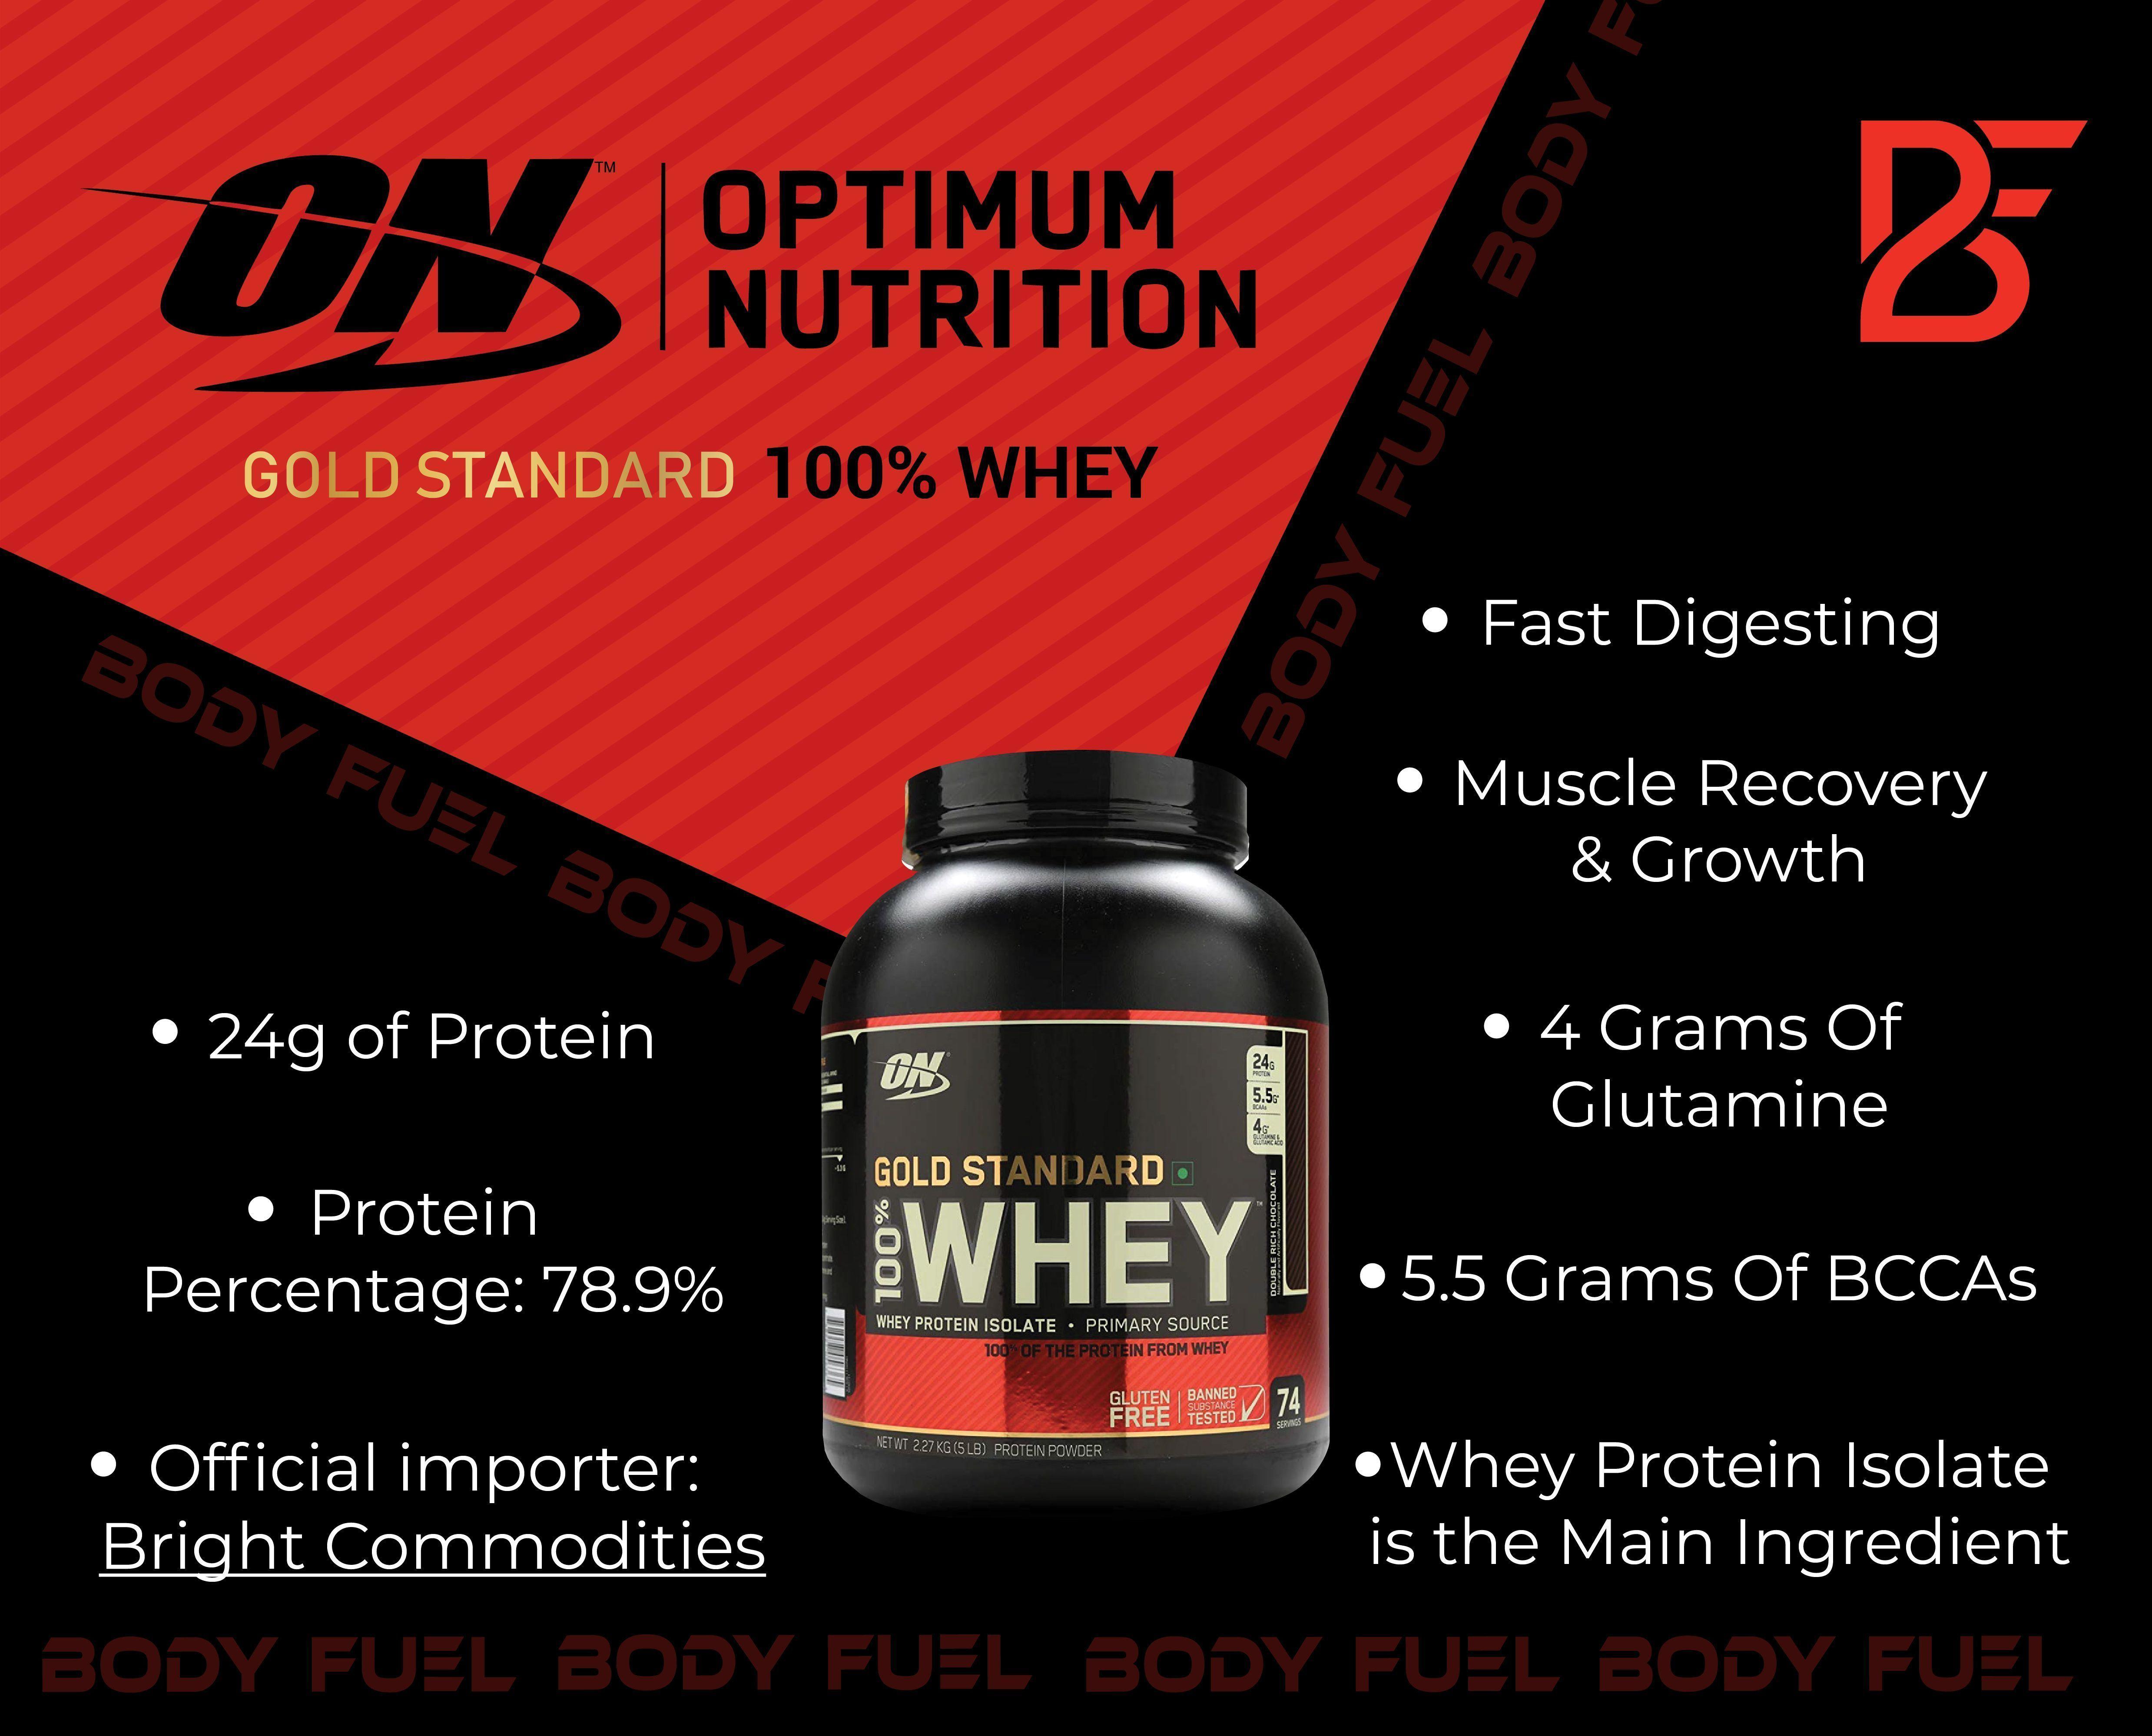 Optimum Nutrition Gold Standard 100 Whey Protein Wheyproteinrecipes Wheyproteinrecipes Optimum Nutrition Gold Standard 100 Whey Protein Wheyproteinr Hurma